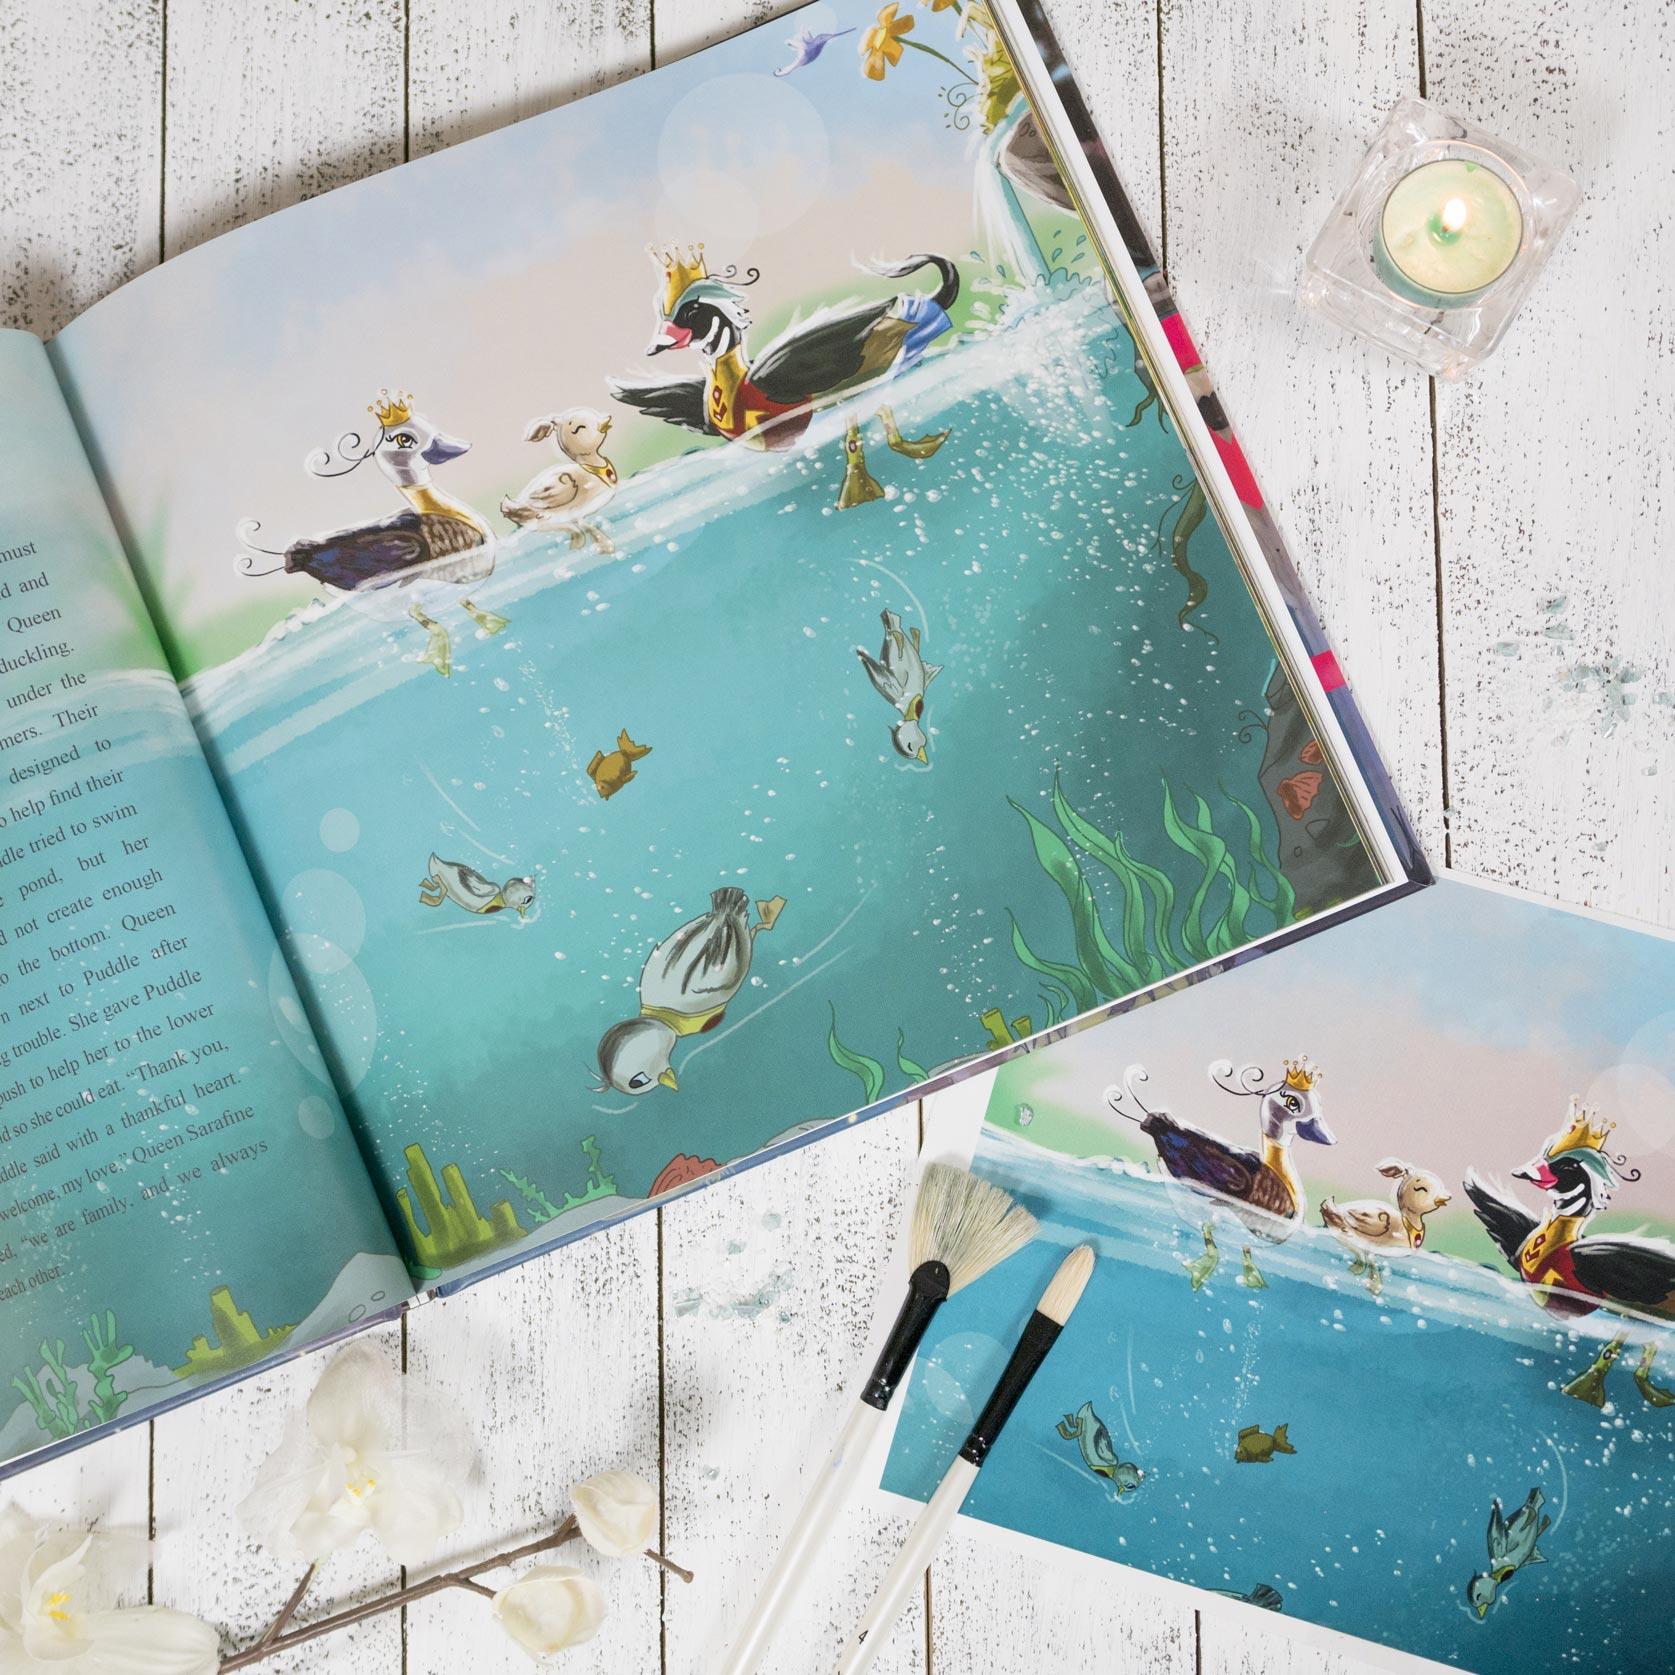 journey-of-puddle-christian-illustrated-children-books-illustrations.jpg